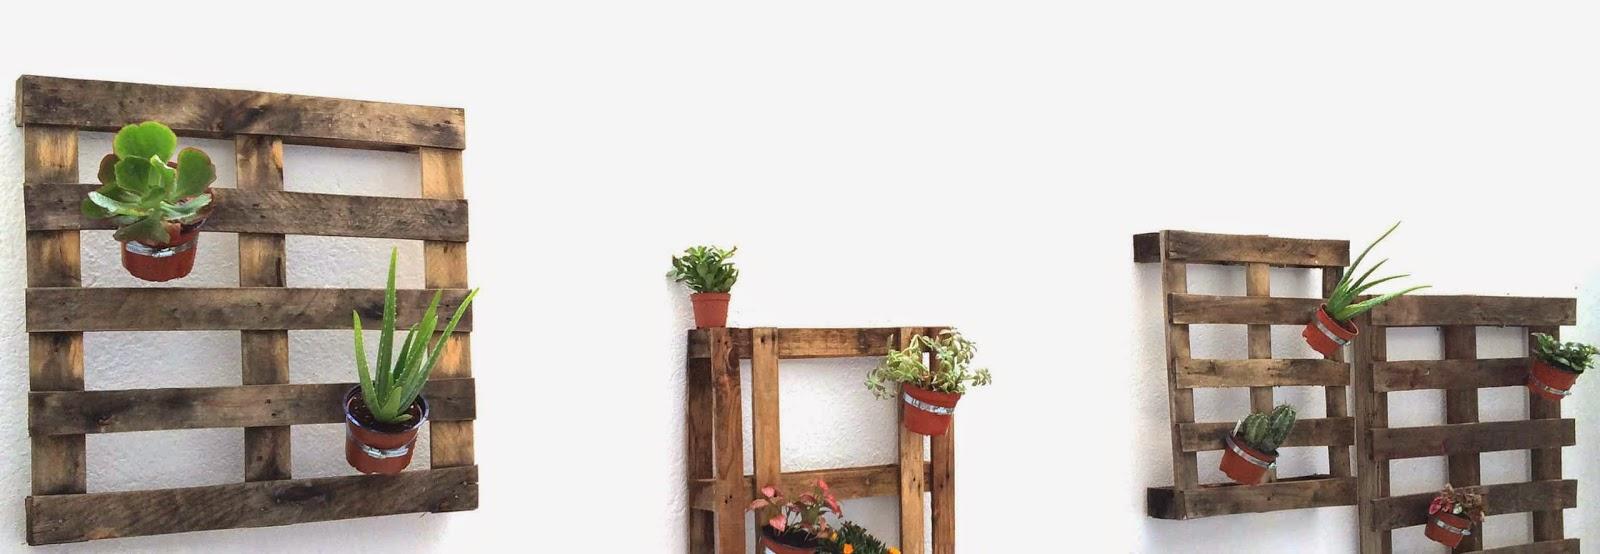 pared vegetal y pallets miuniversodiy